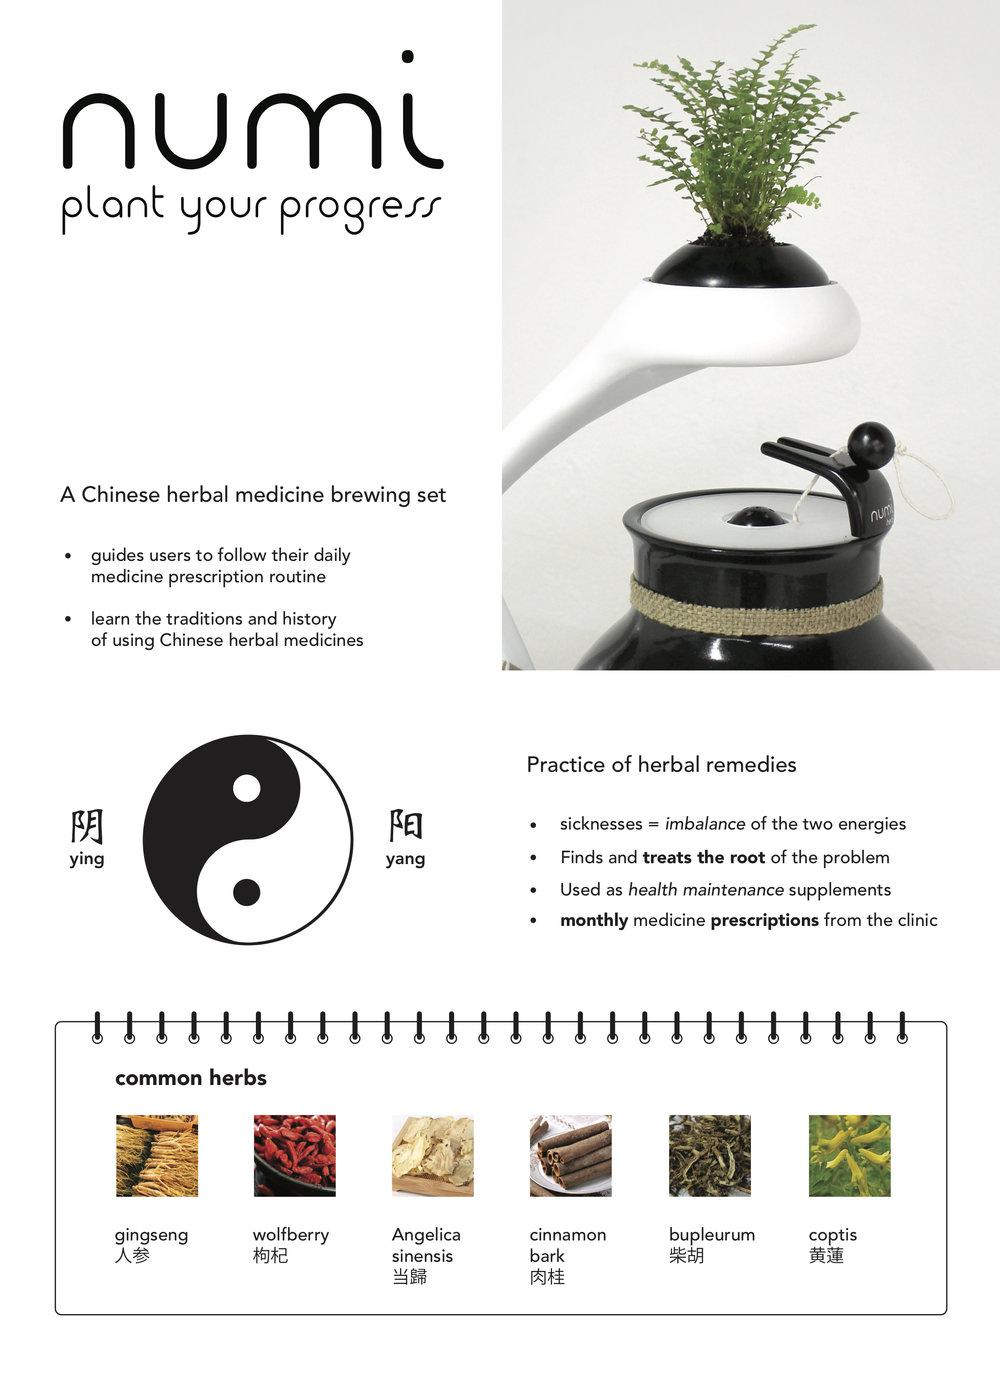 Chinese health herbal medicine supplement - The Way Western Medicines Work